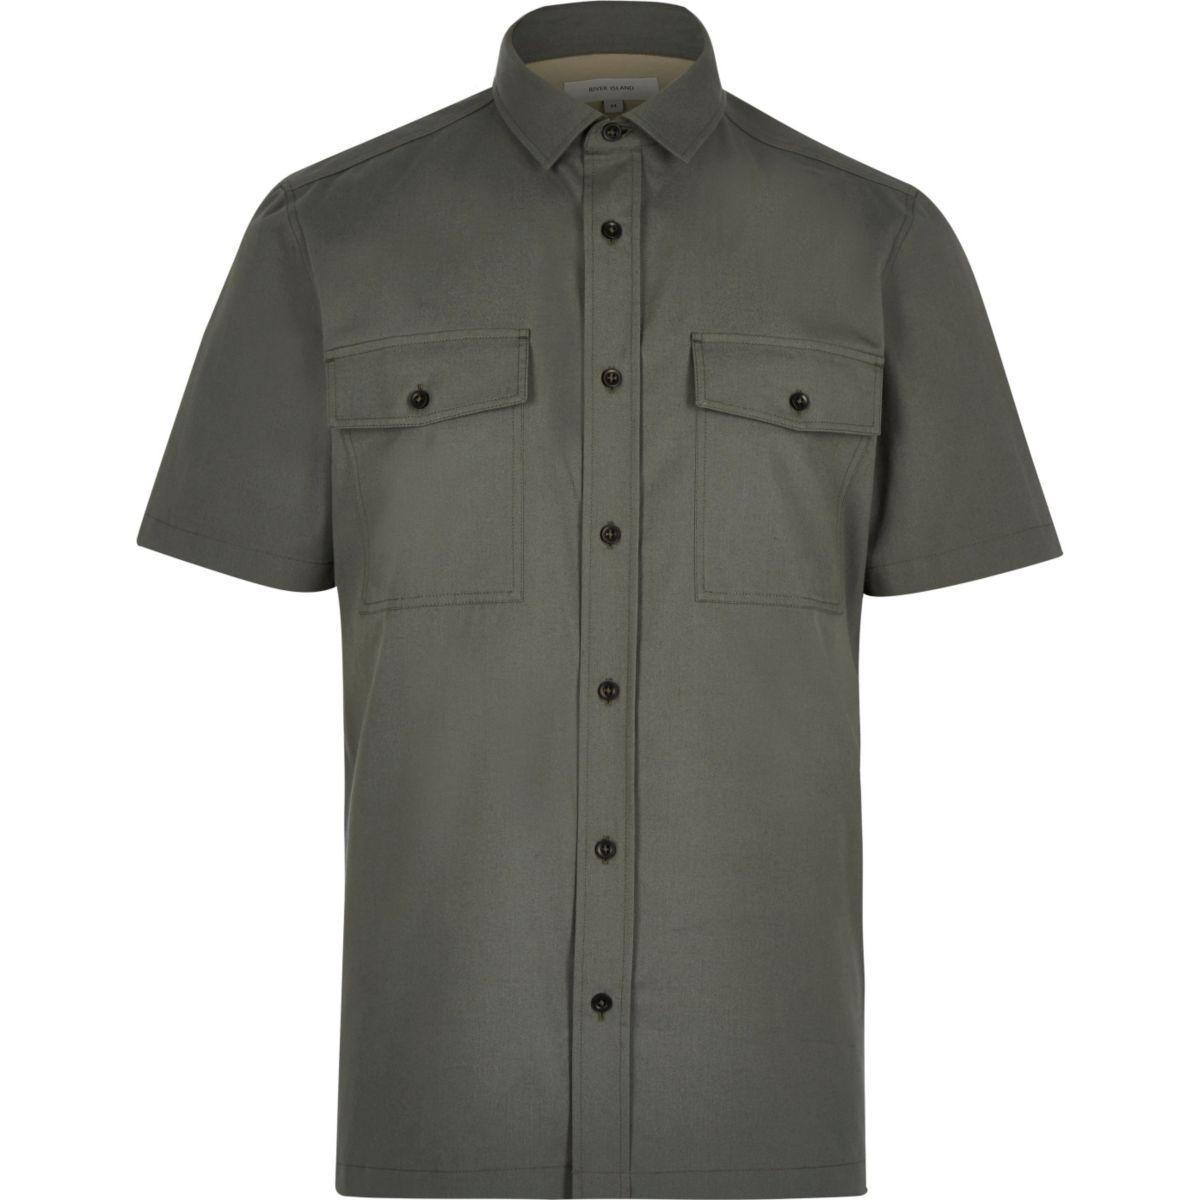 Khaki green utility short sleeve shirt